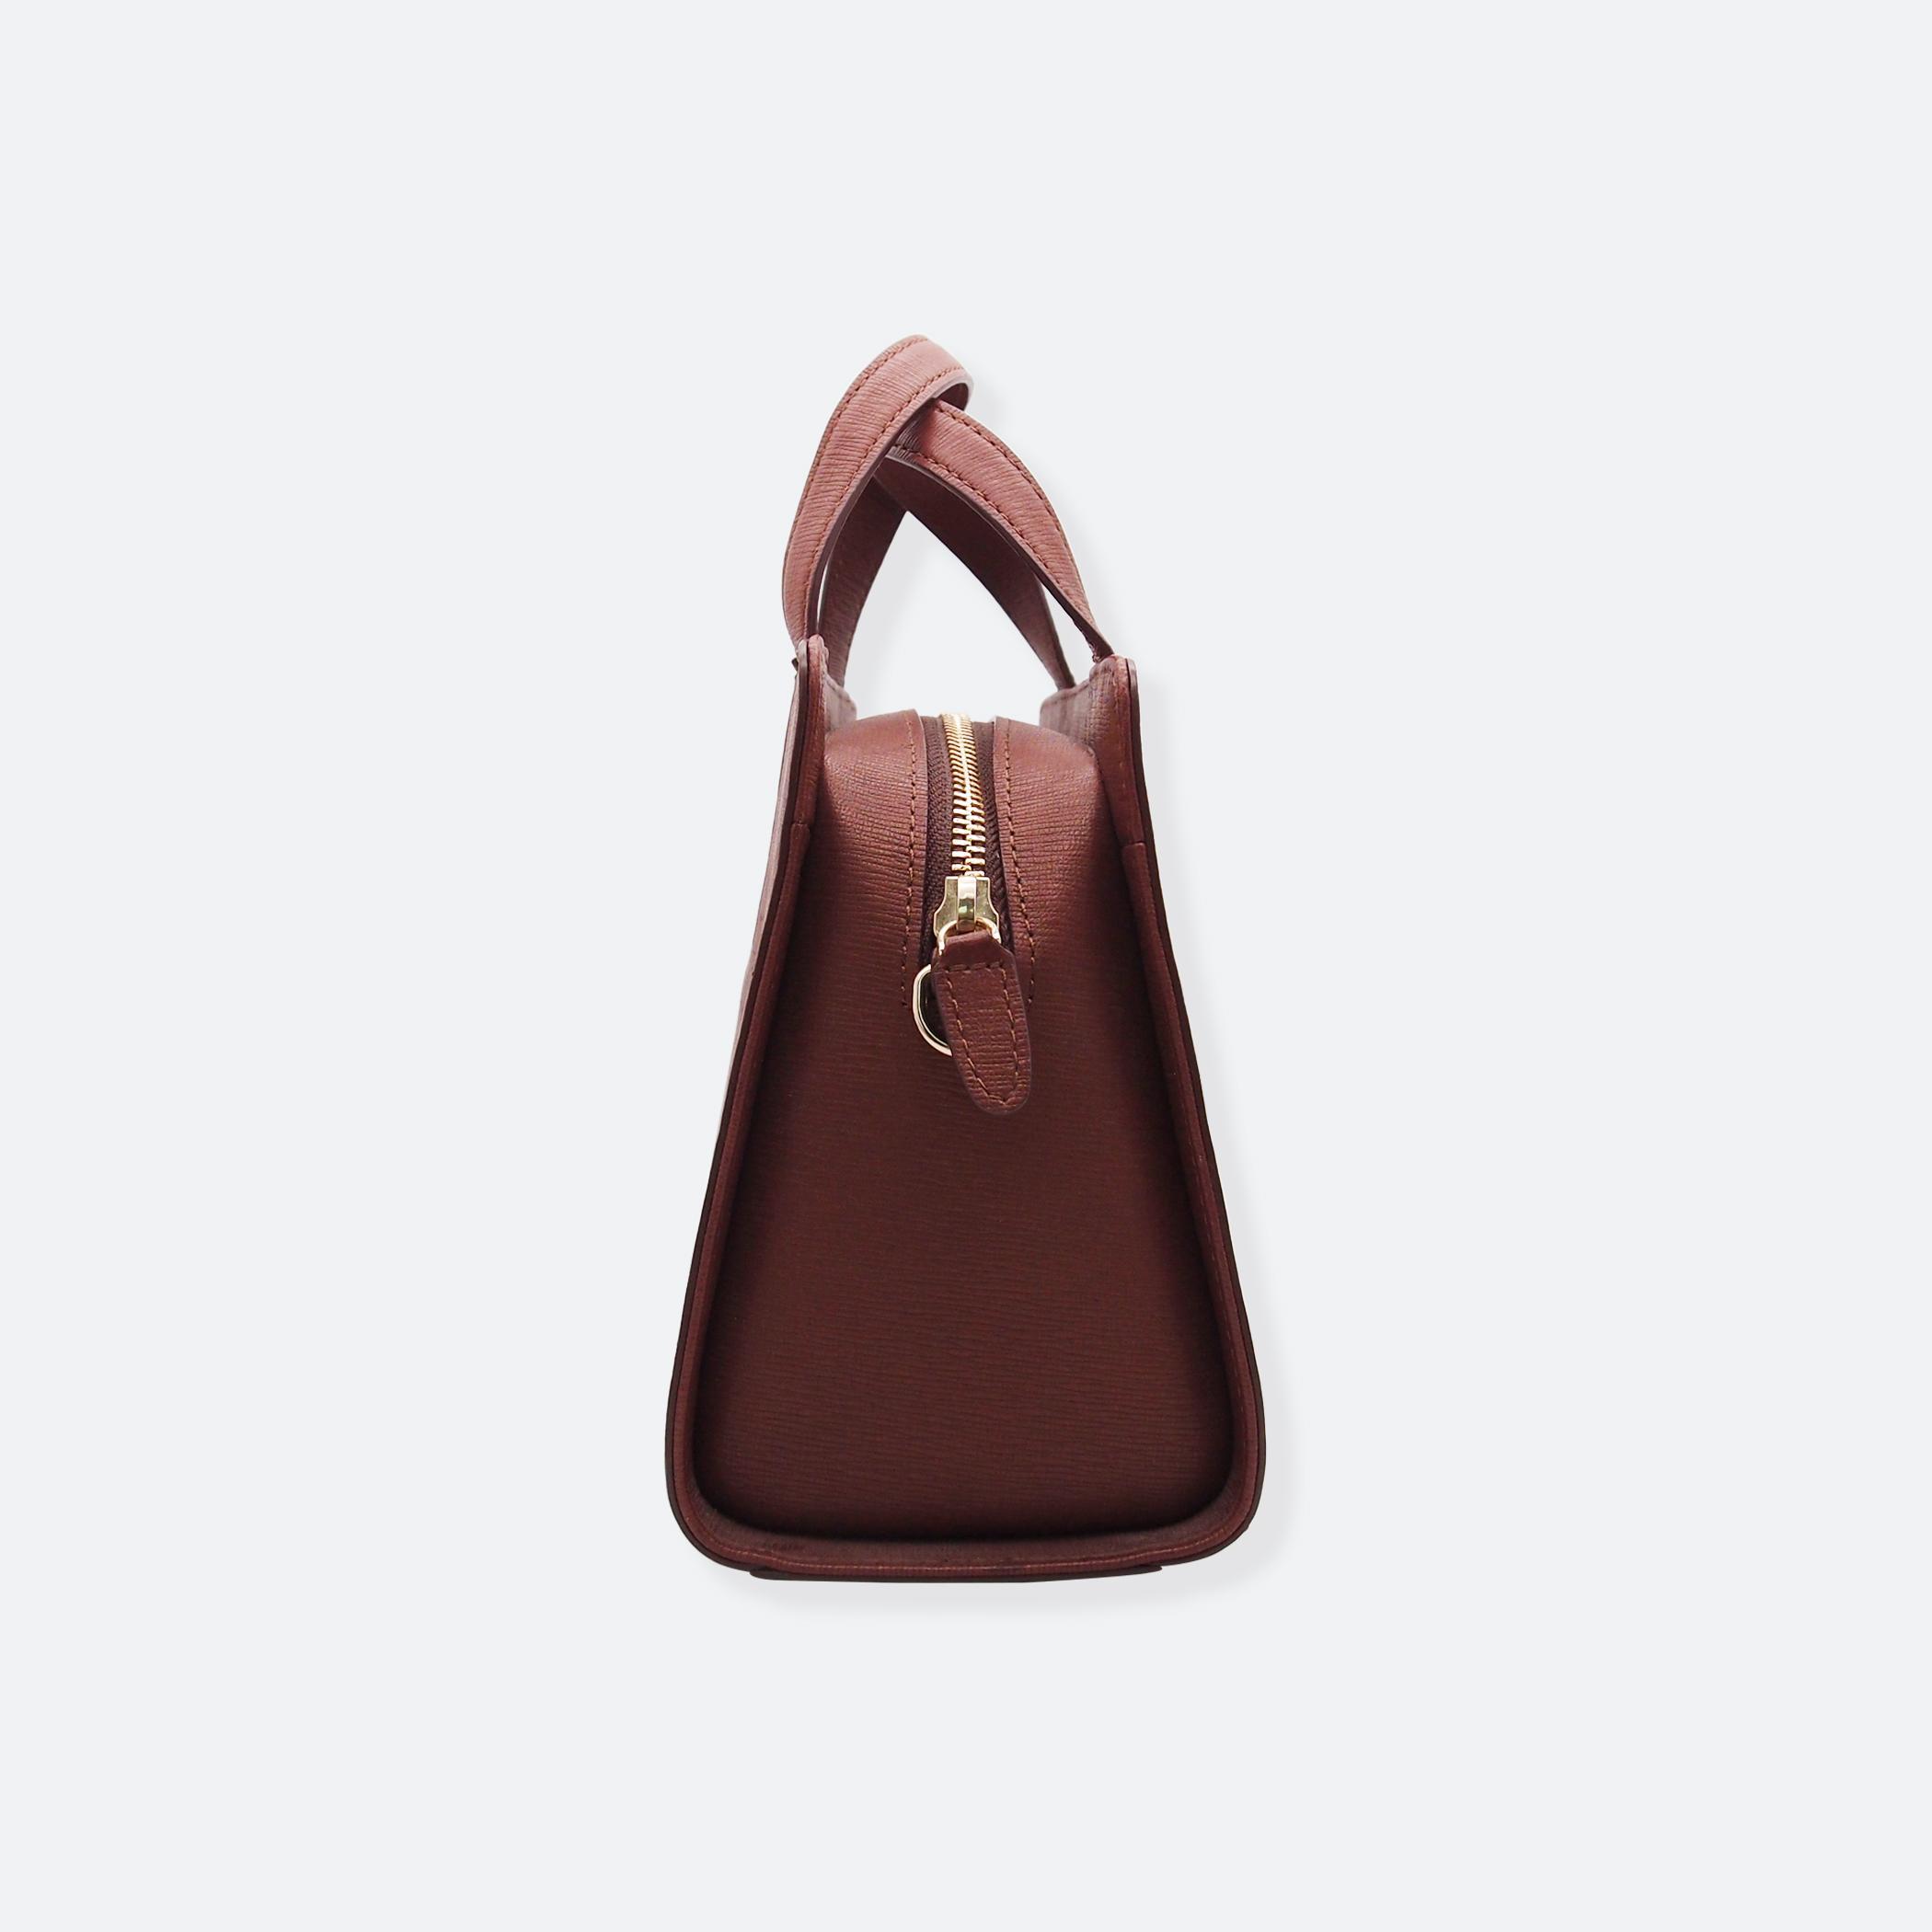 OhMart B043 (Brown) 3